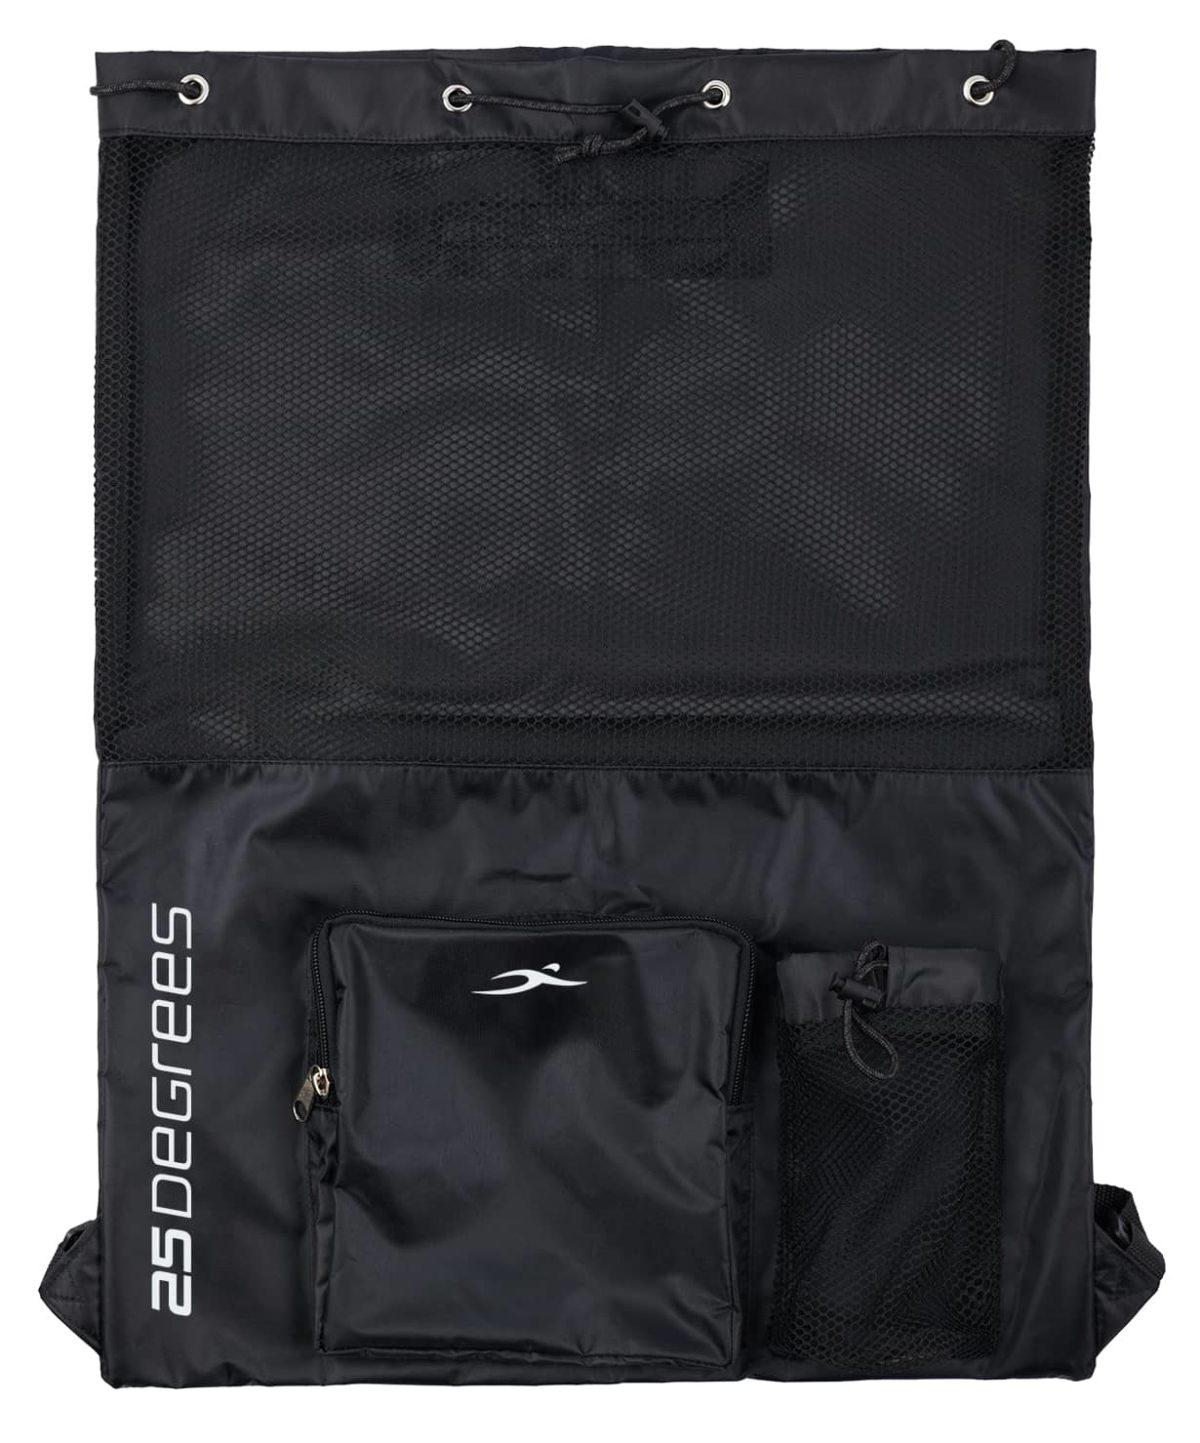 25DEGREES Рюкзак Maxpack  25D21015: чёрный - 1